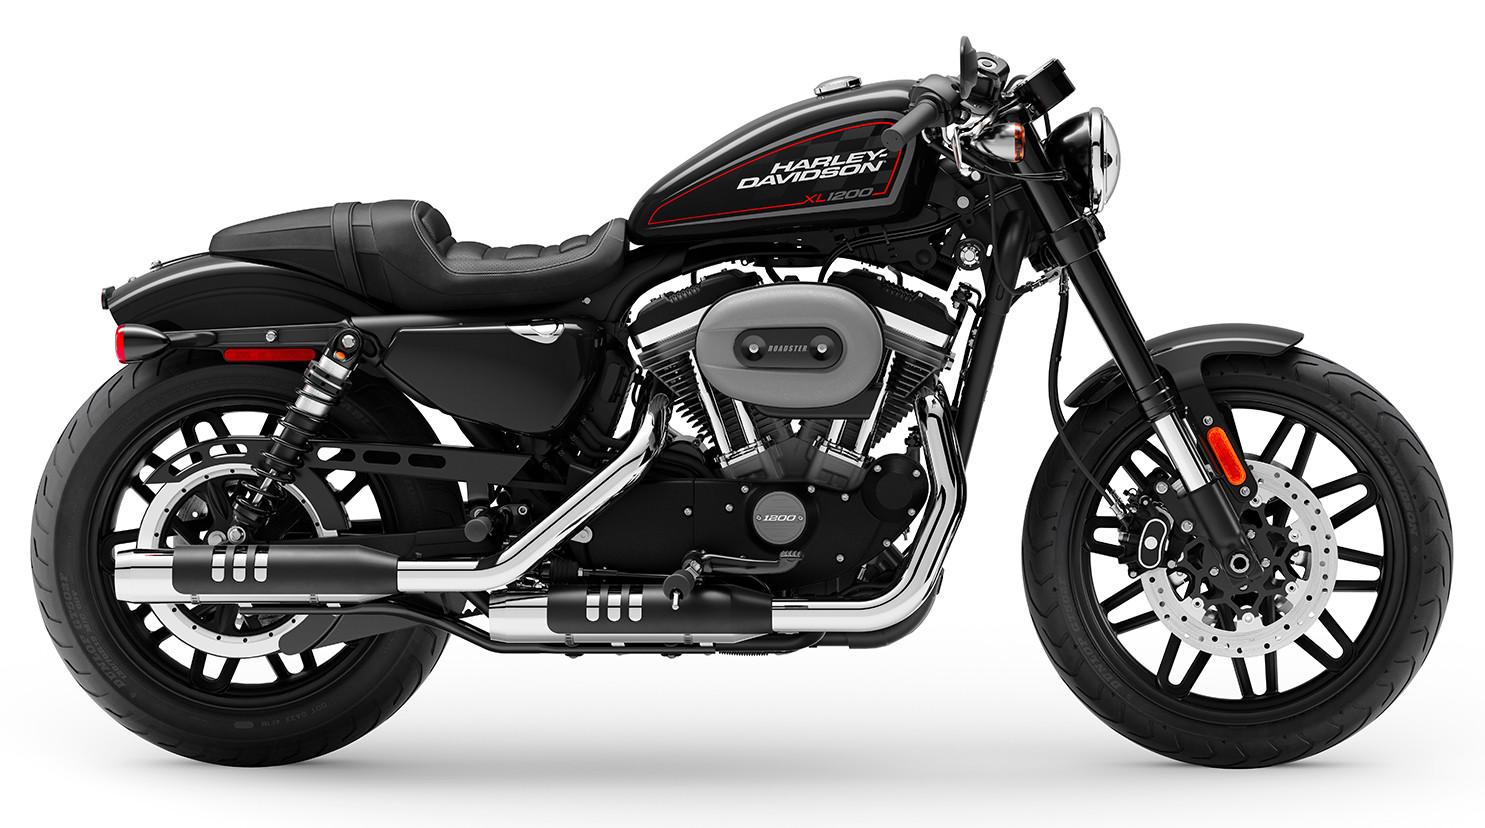 A 2020 Harley-Davidson XL1200 Sportster Roadster. Photo courtesy Dunlop.